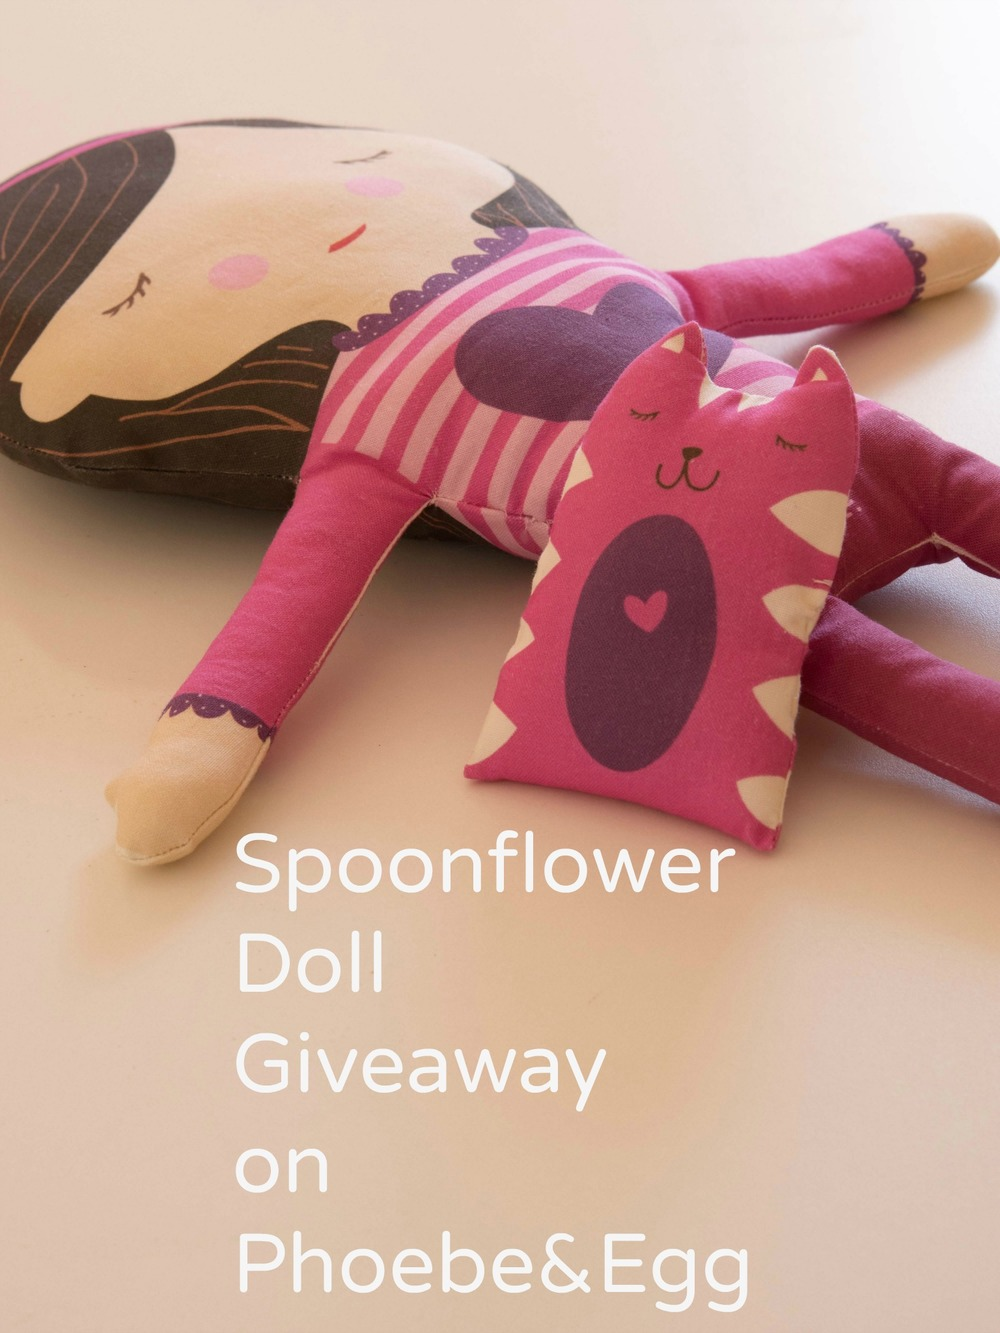 Spoonflower doll